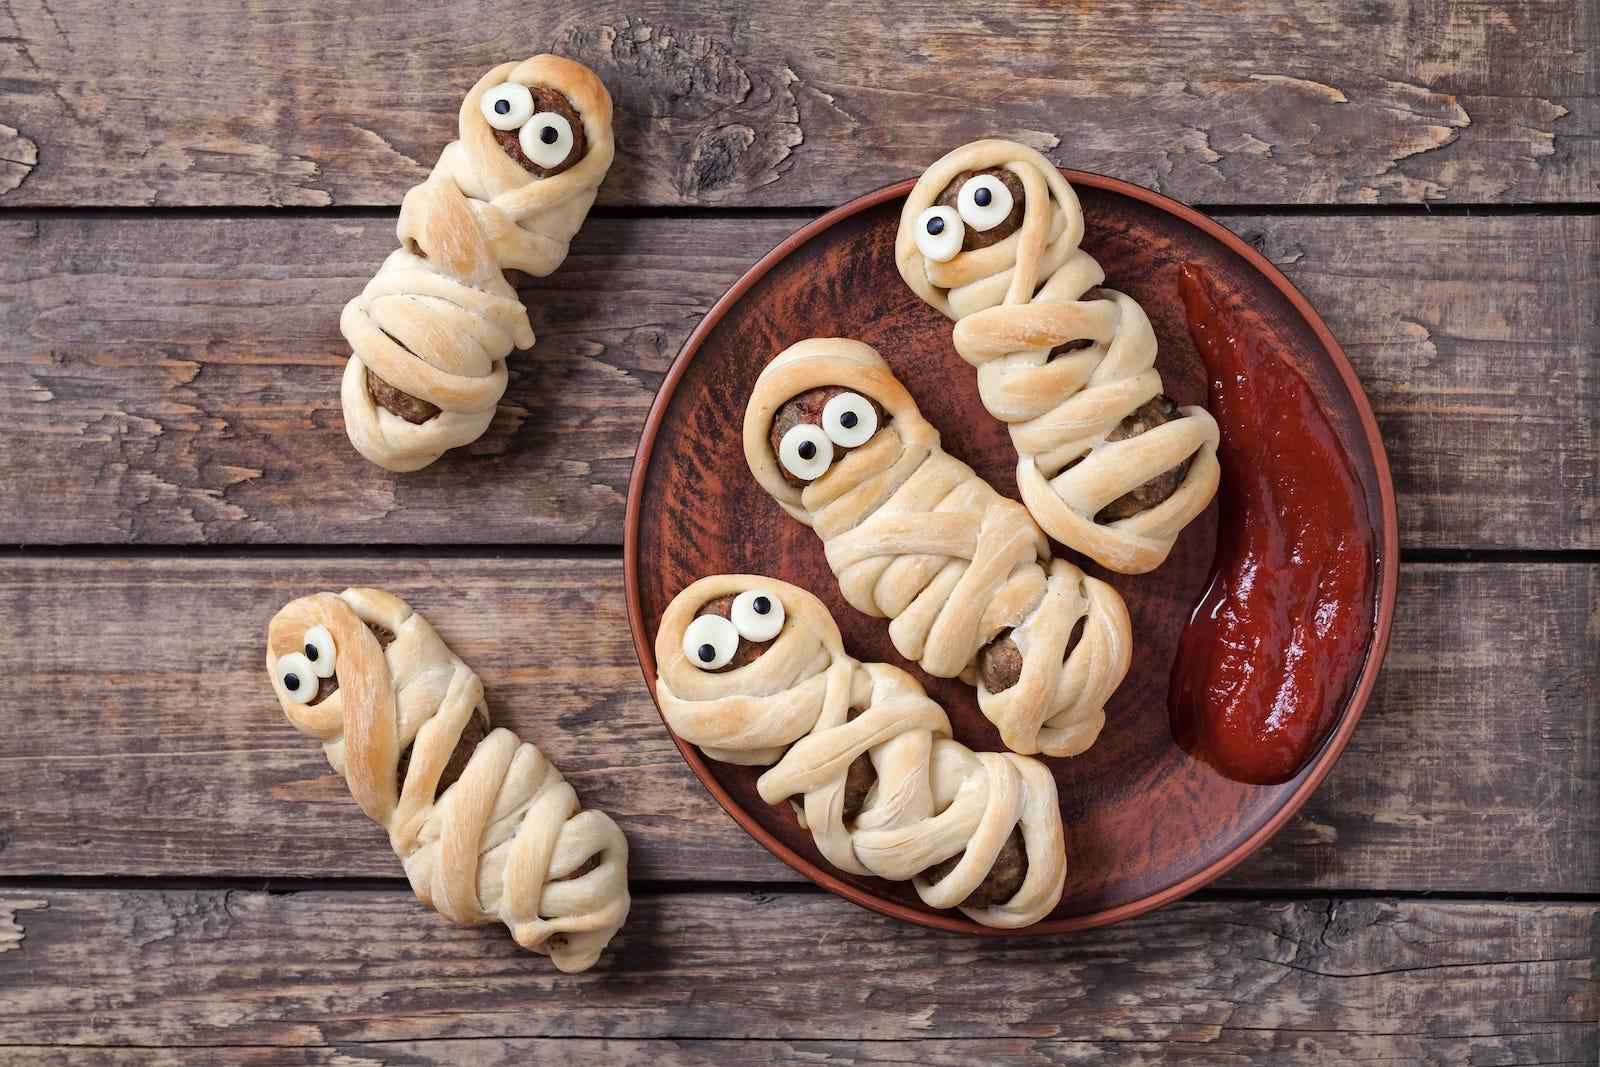 mummy hot dog